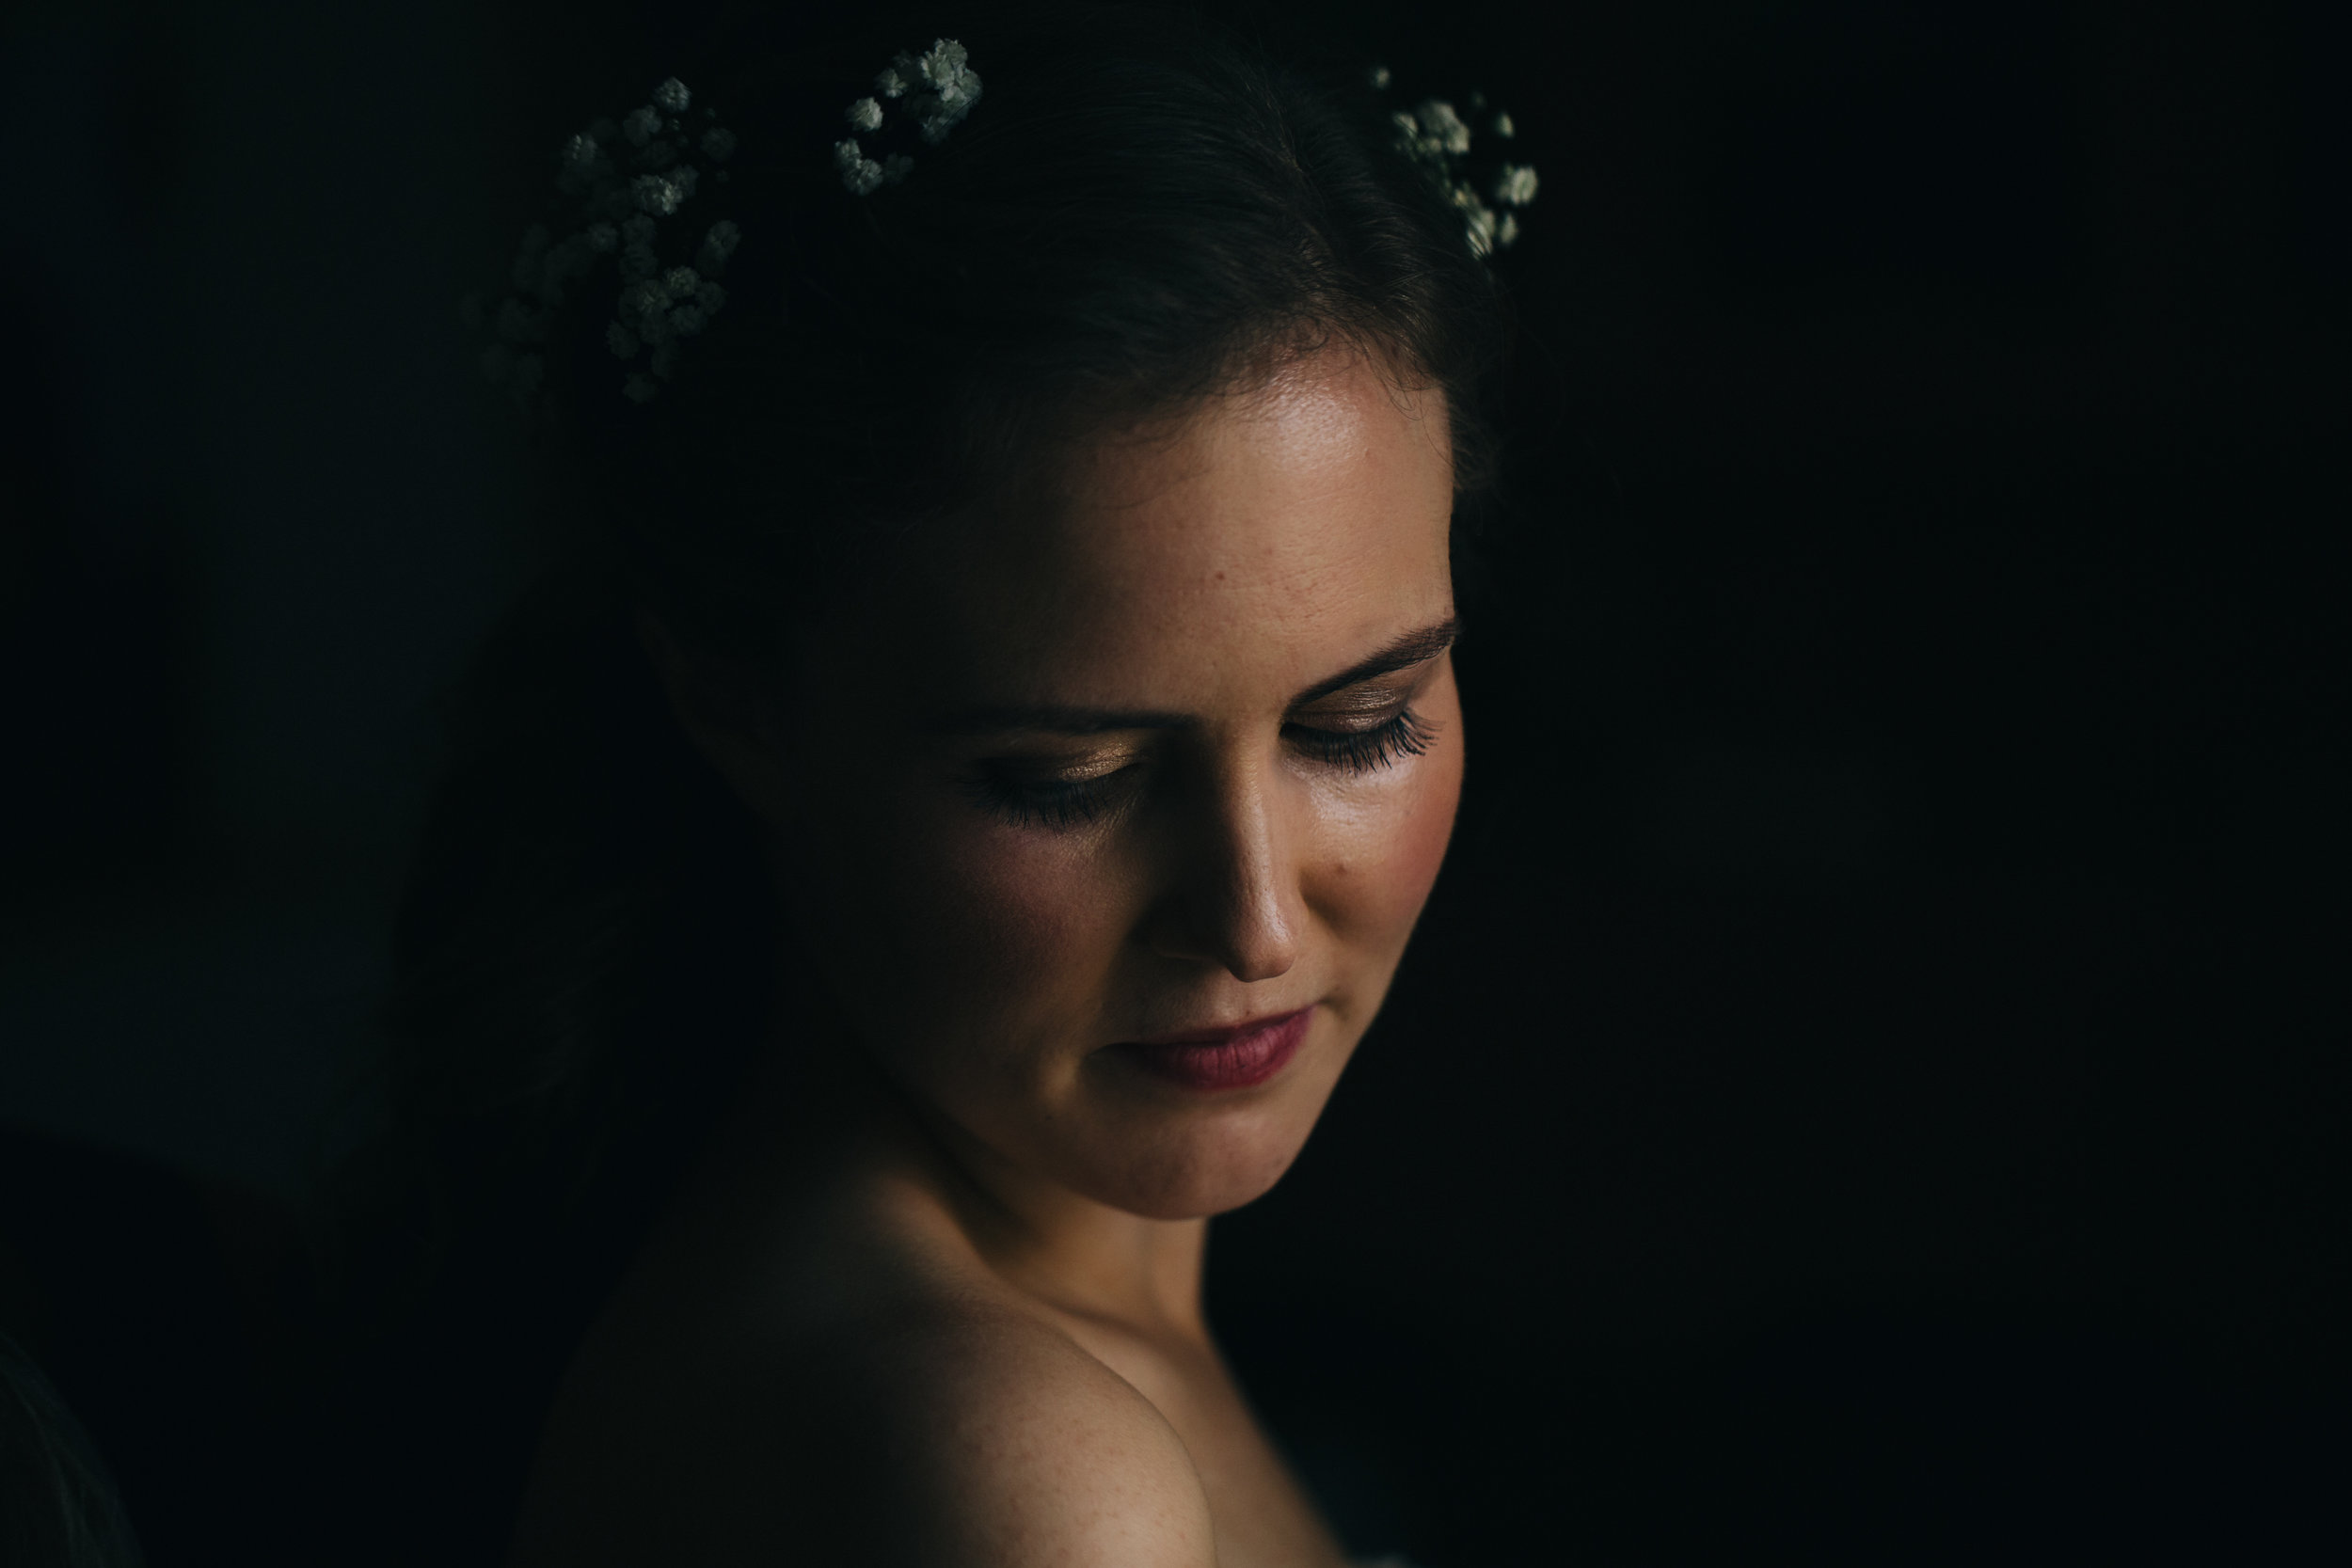 Wedding photography of bride before wedding.